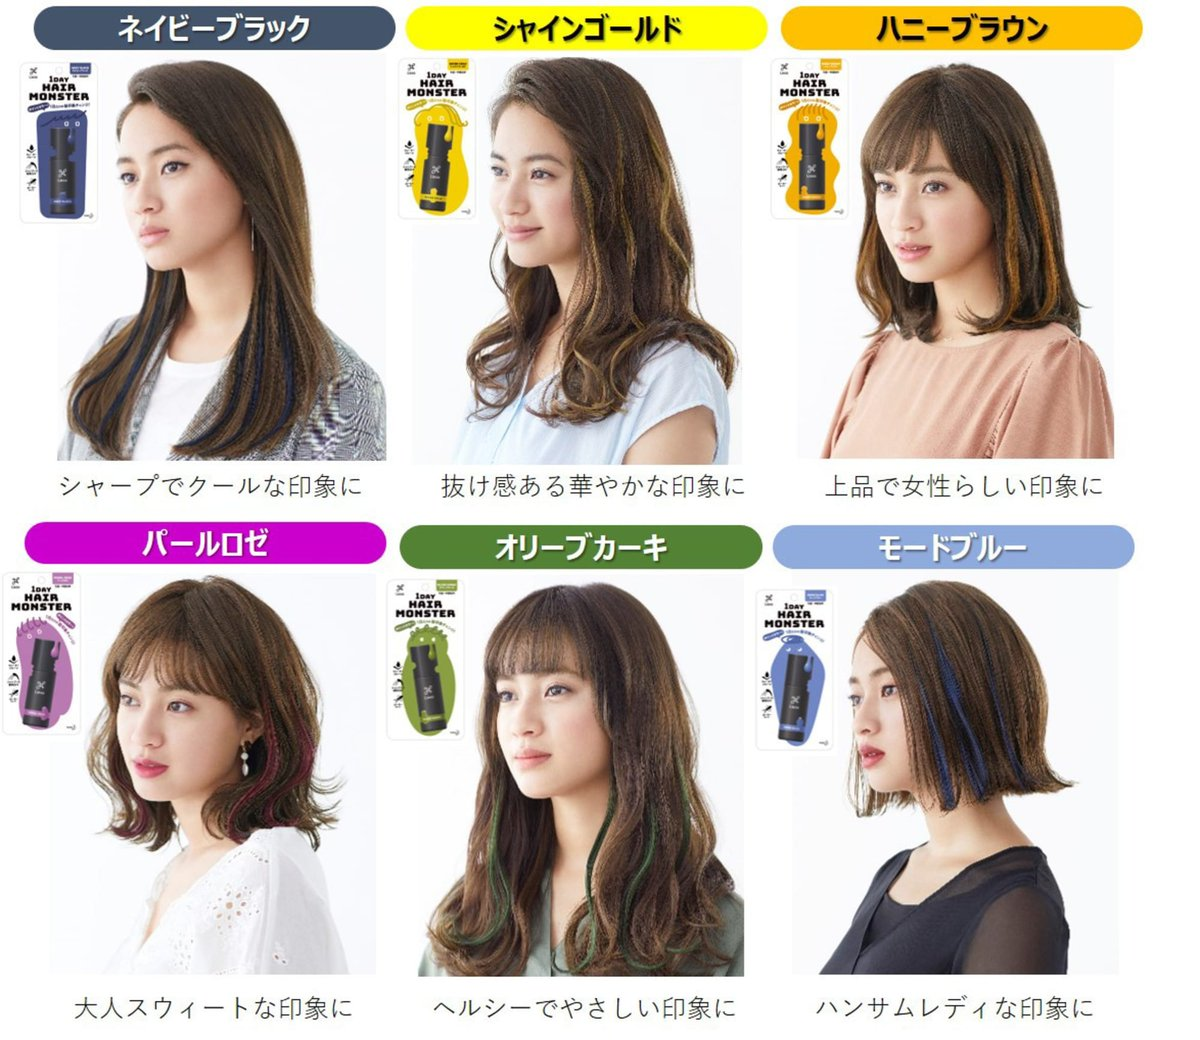 FASHIONSNAP.COMさんの投稿画像